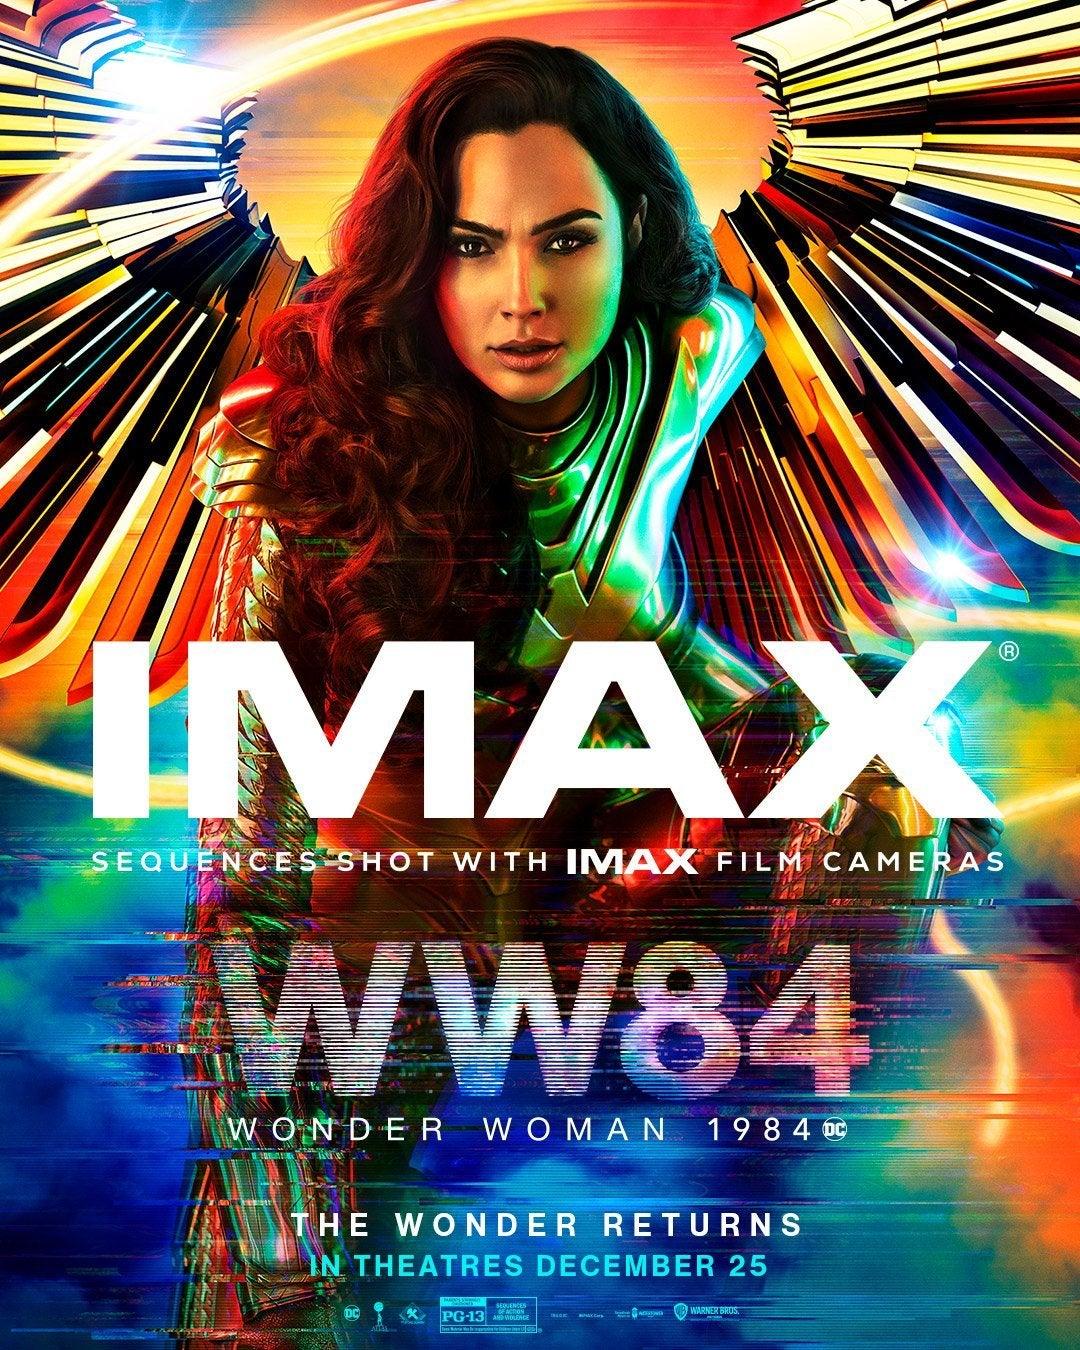 wonder woman 1984 imax poster gal gadot 1